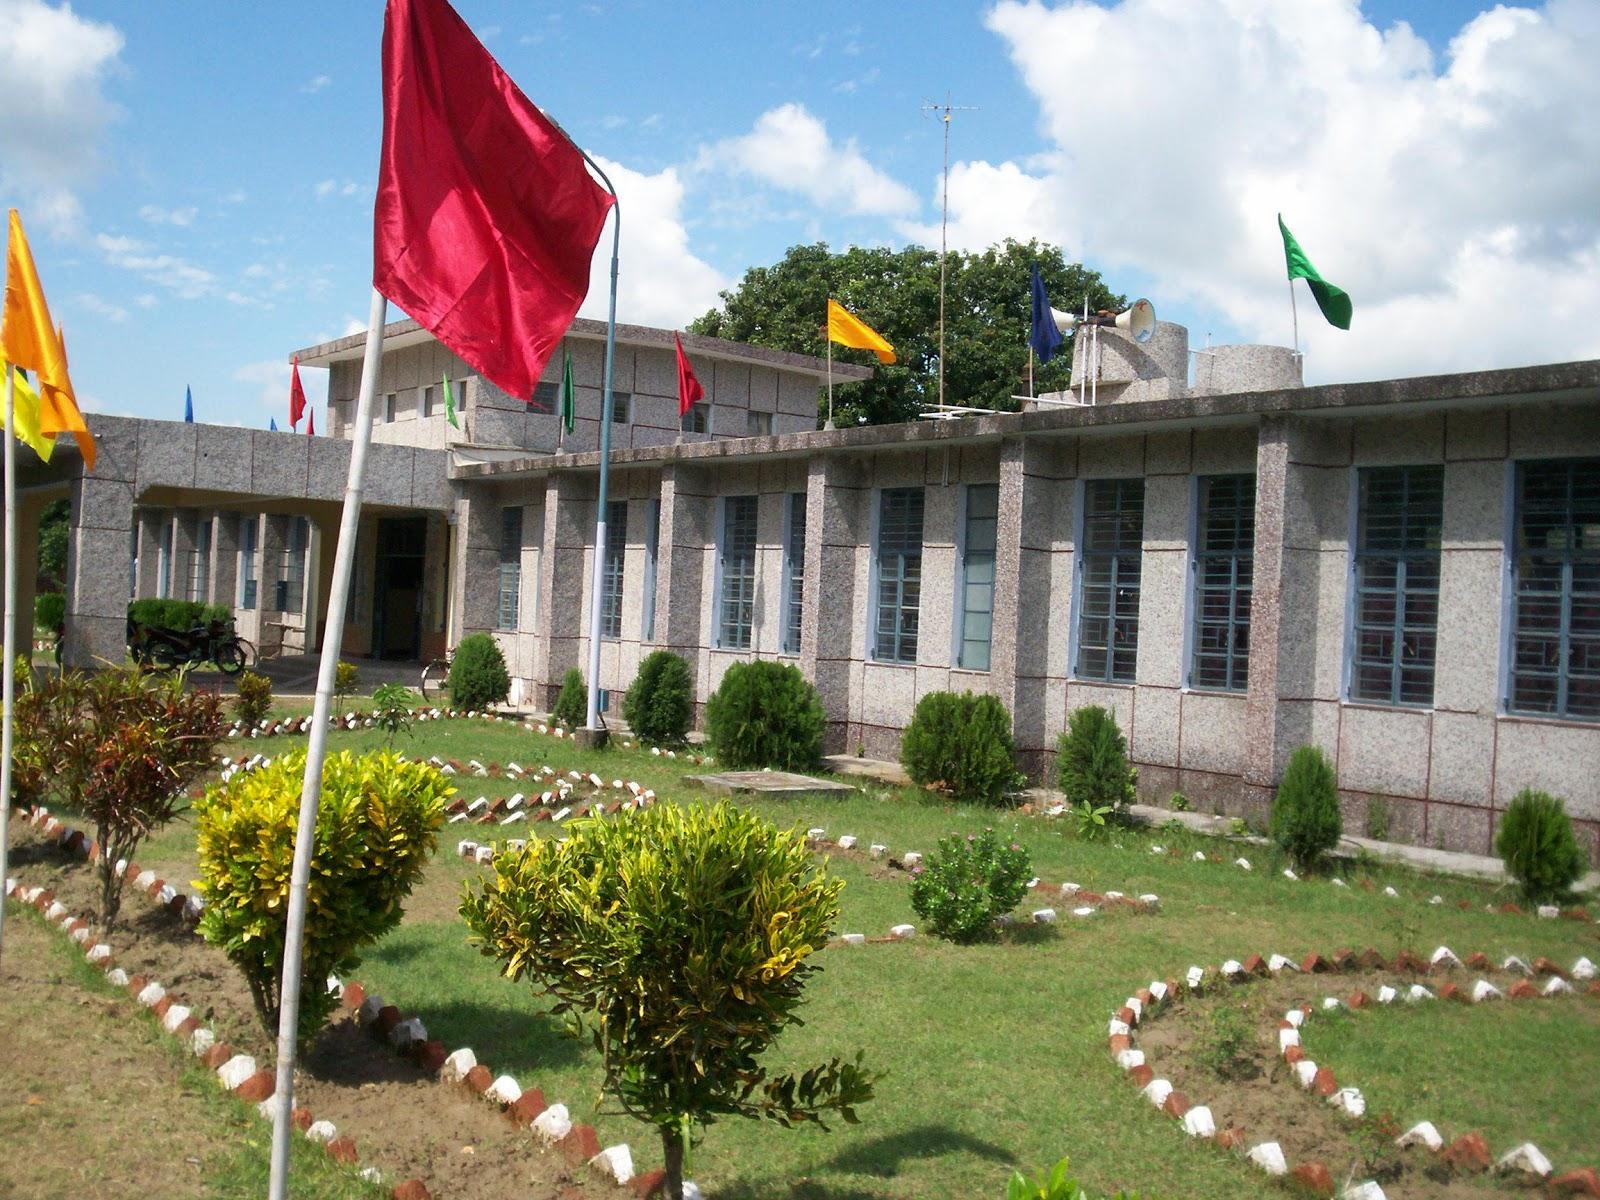 navodaya vidyalaya online application form 2017